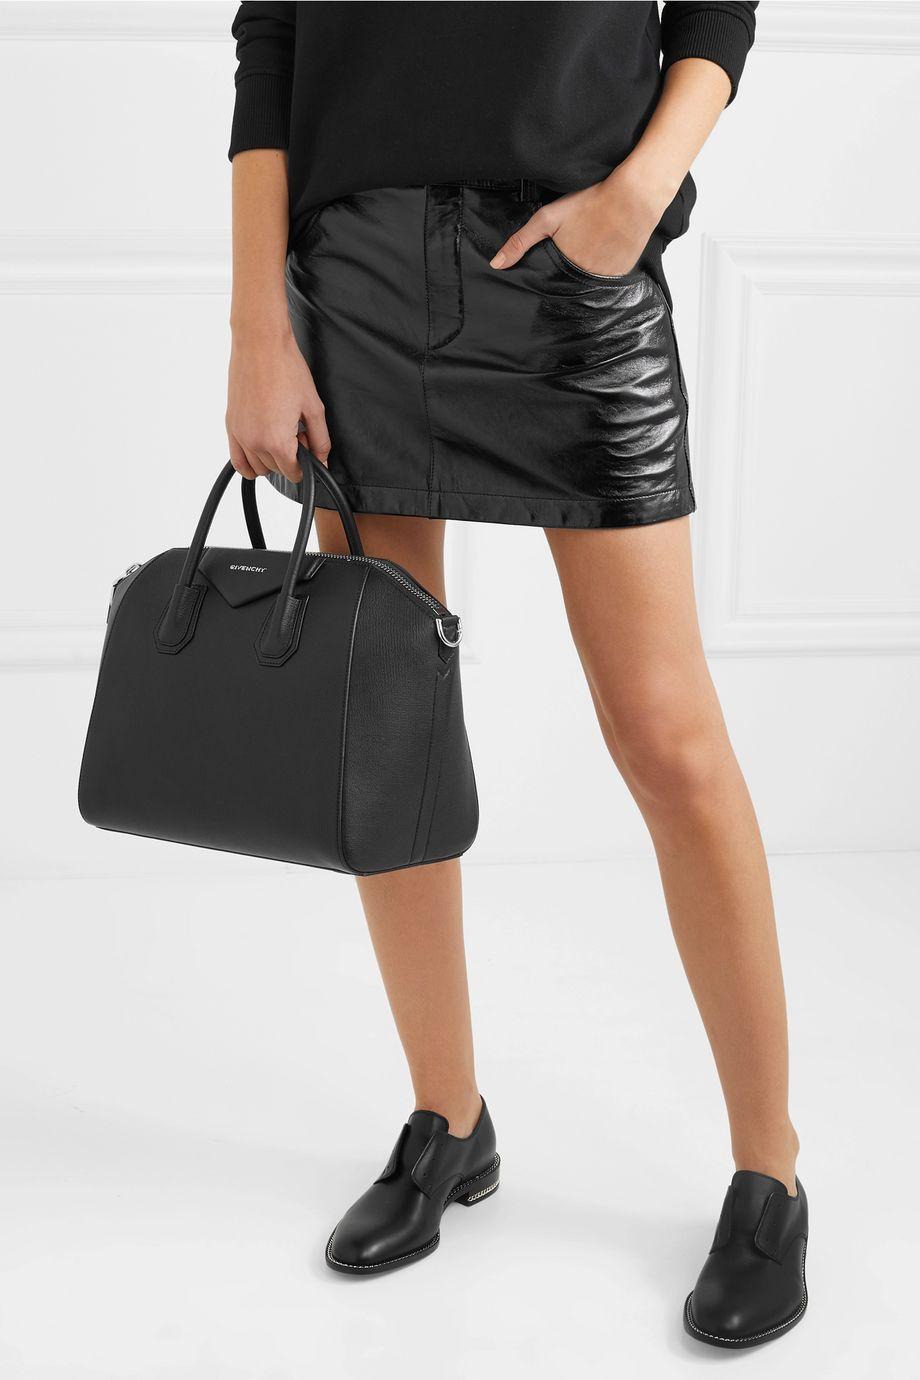 Givenchy Antigona medium textured-leather tote